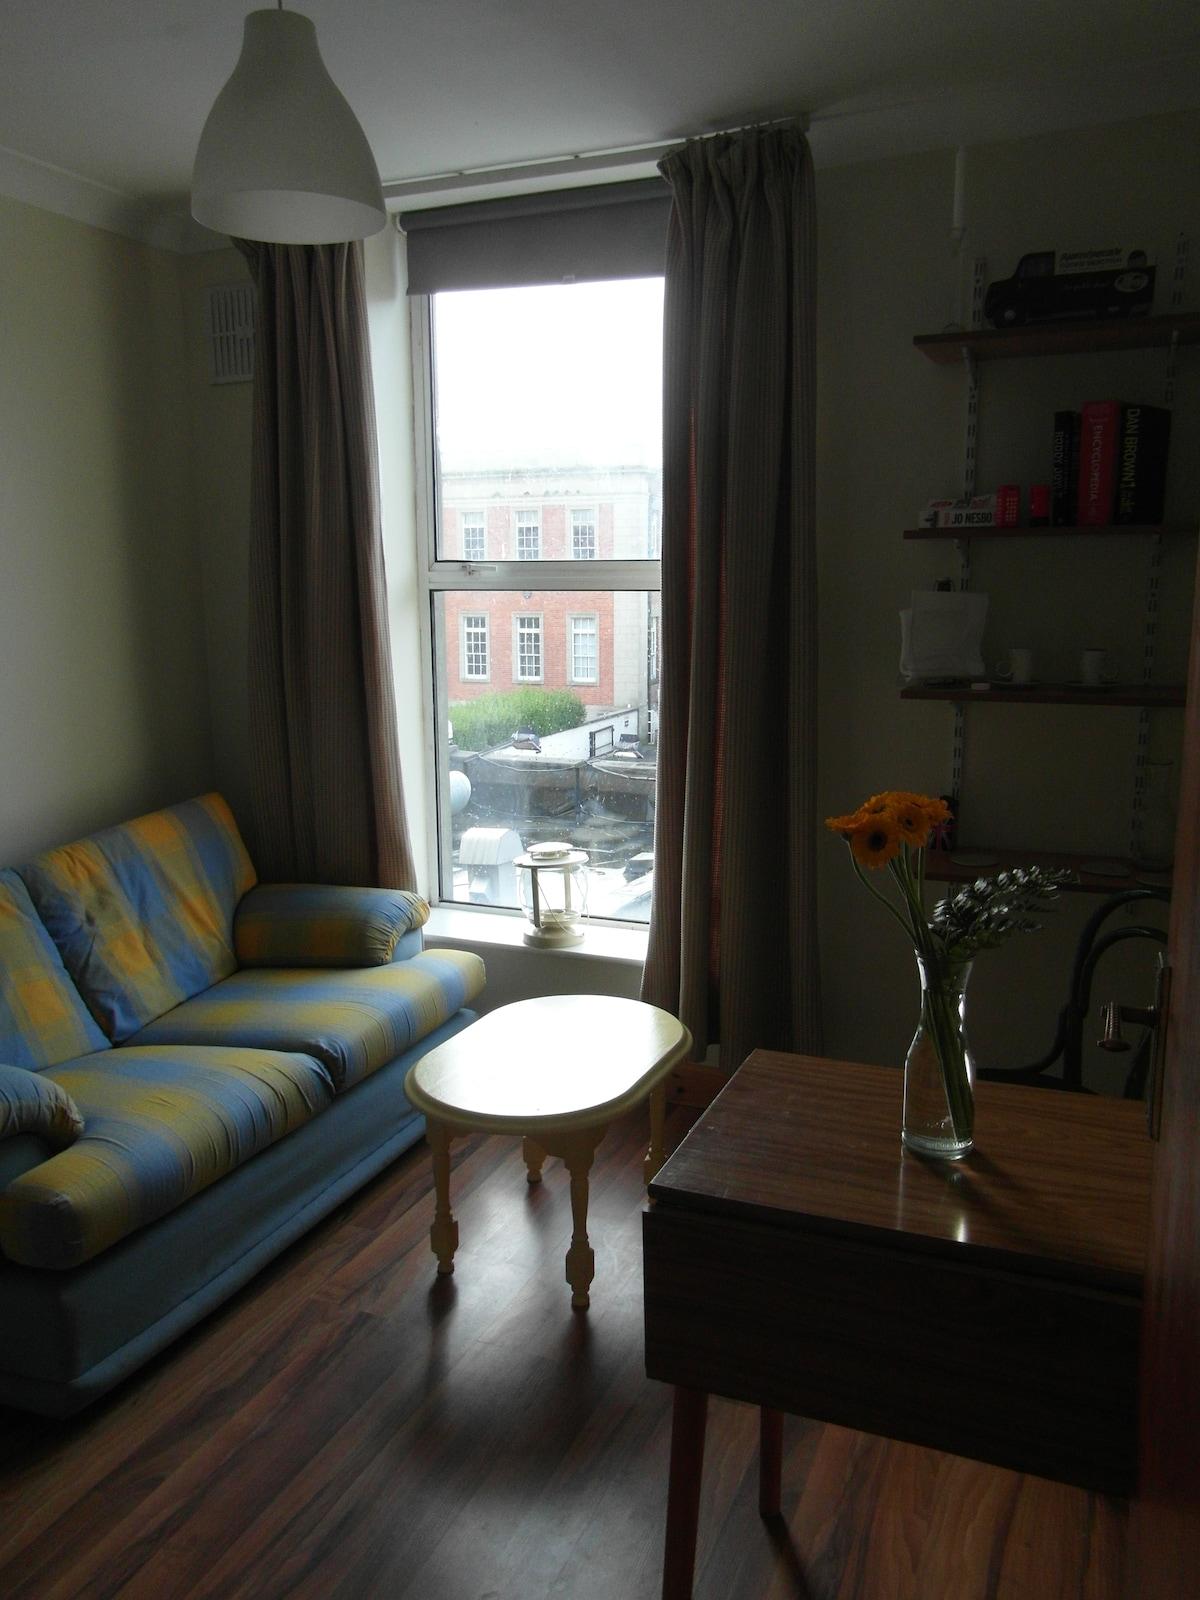 #9 - One bedroom apartment